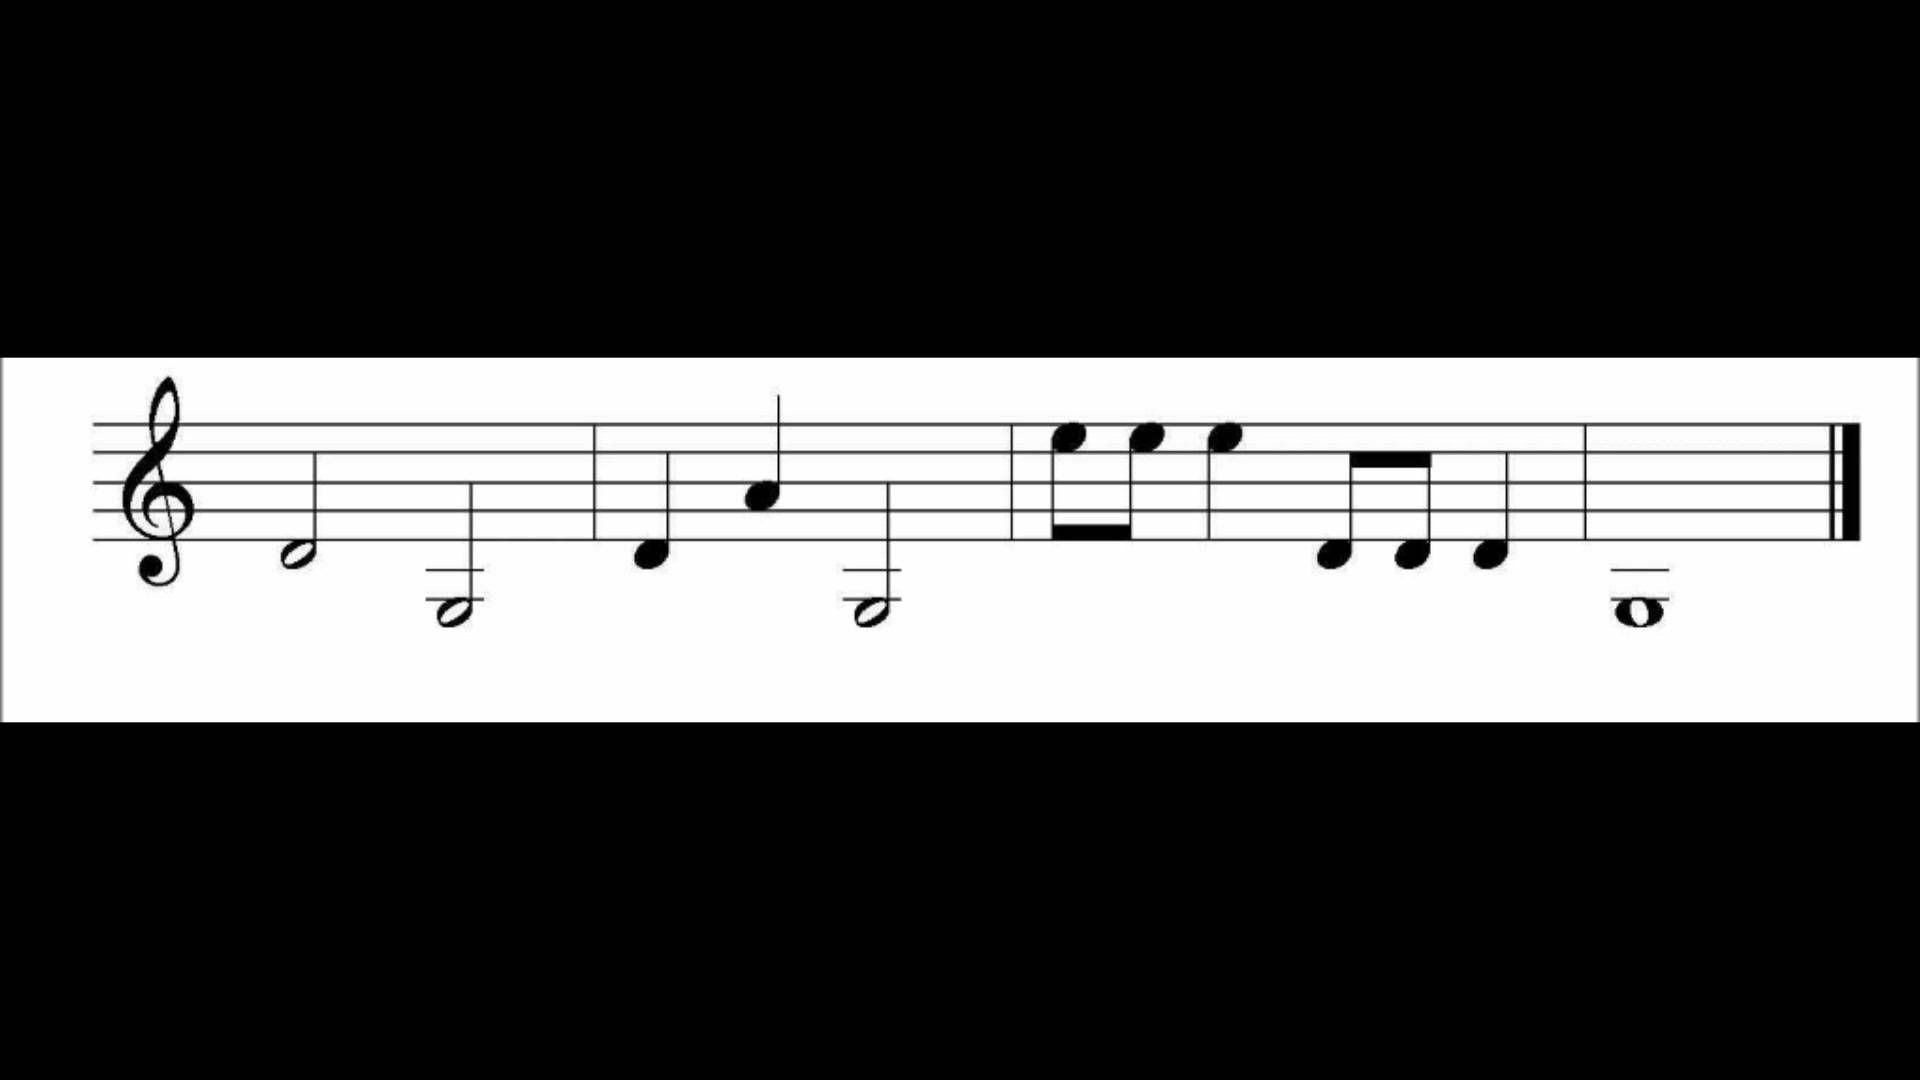 Exercícios de cordas soltas para violino (iniciantes)